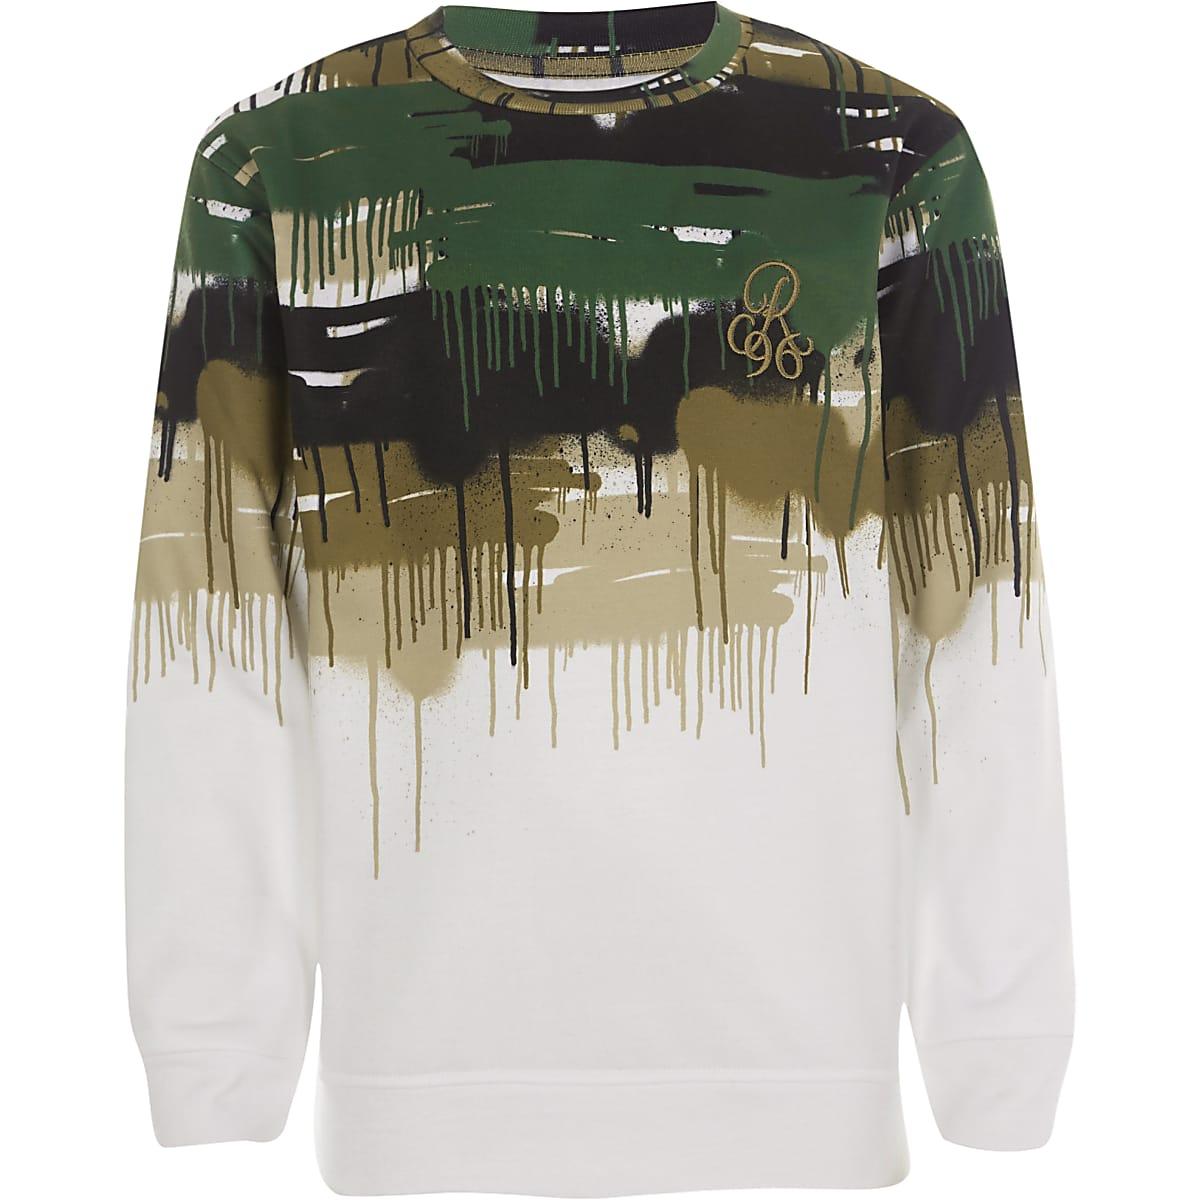 Boys white 'R96' camo sweatshirt